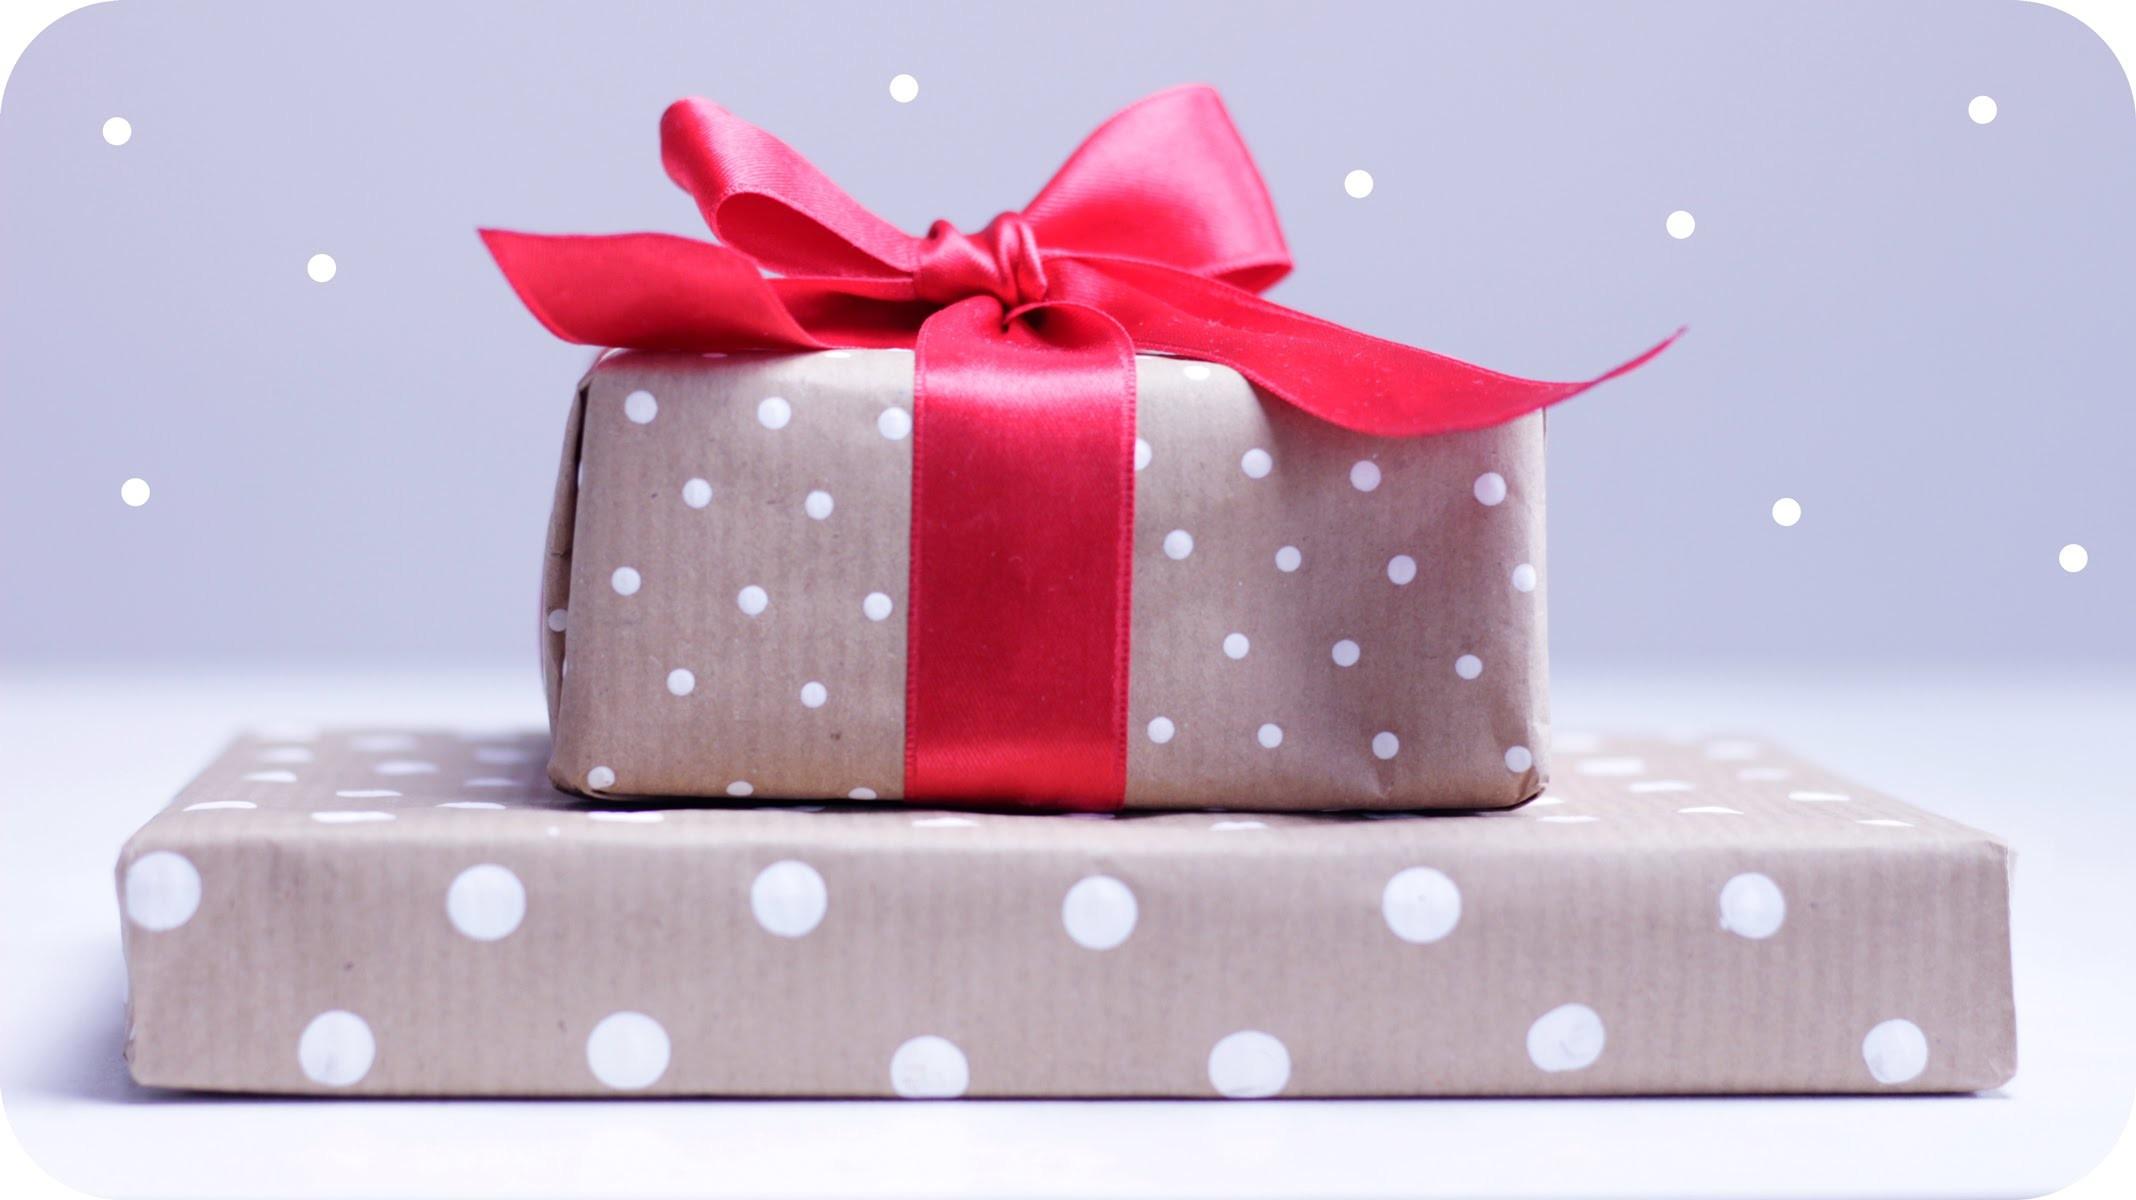 diy p nktchen geschenkpapier selber machen polka dots. Black Bedroom Furniture Sets. Home Design Ideas